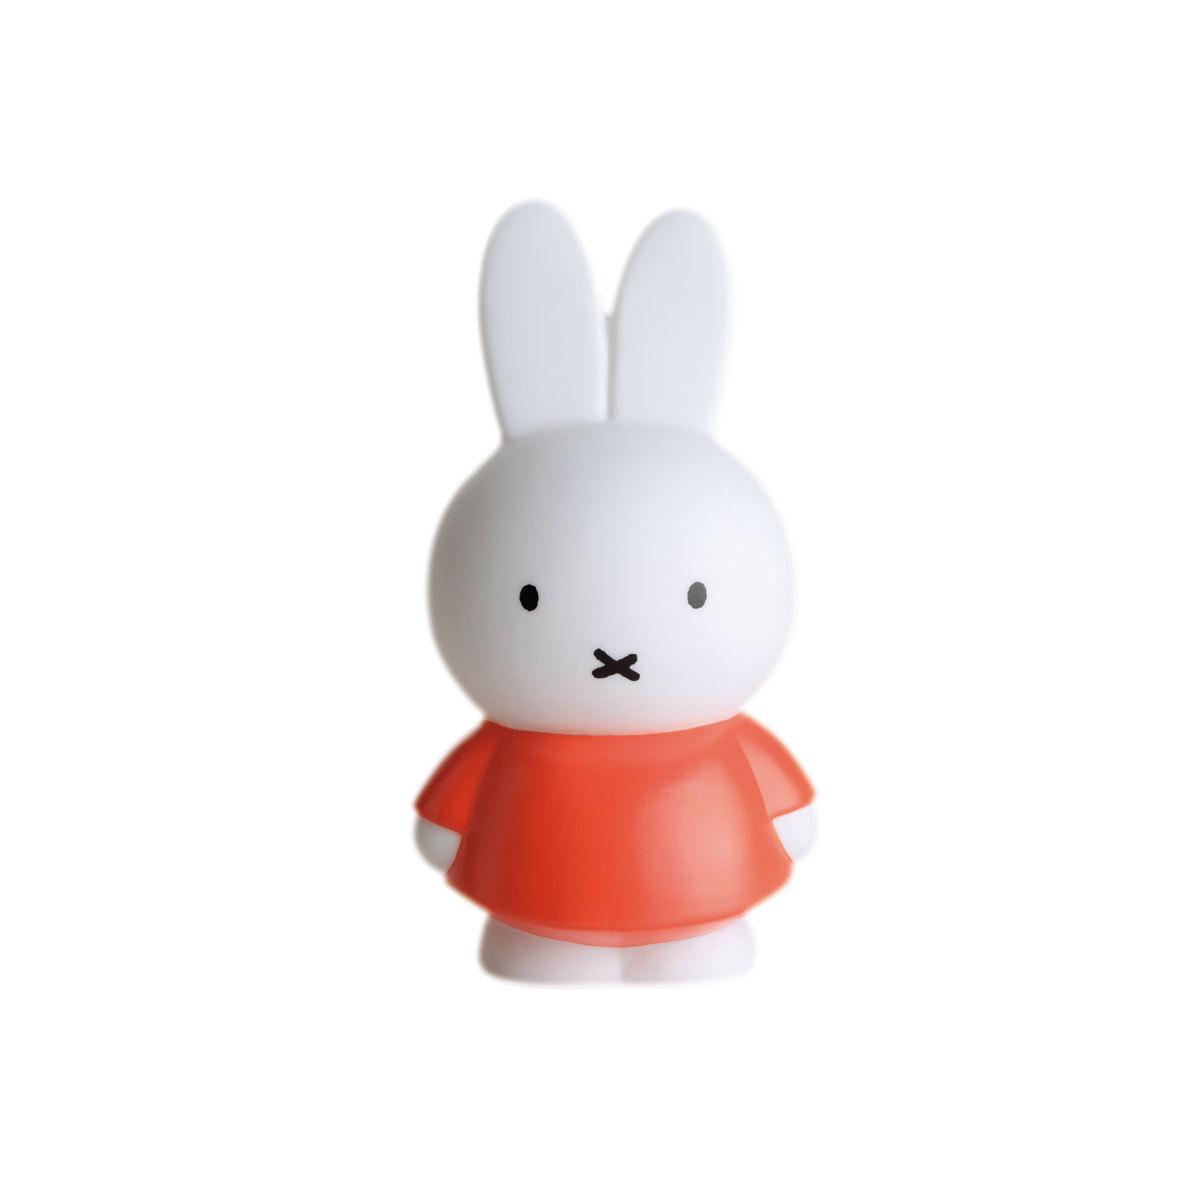 Tirelire Tirelire Miffy - Orange Tirelire Miffy - Orange